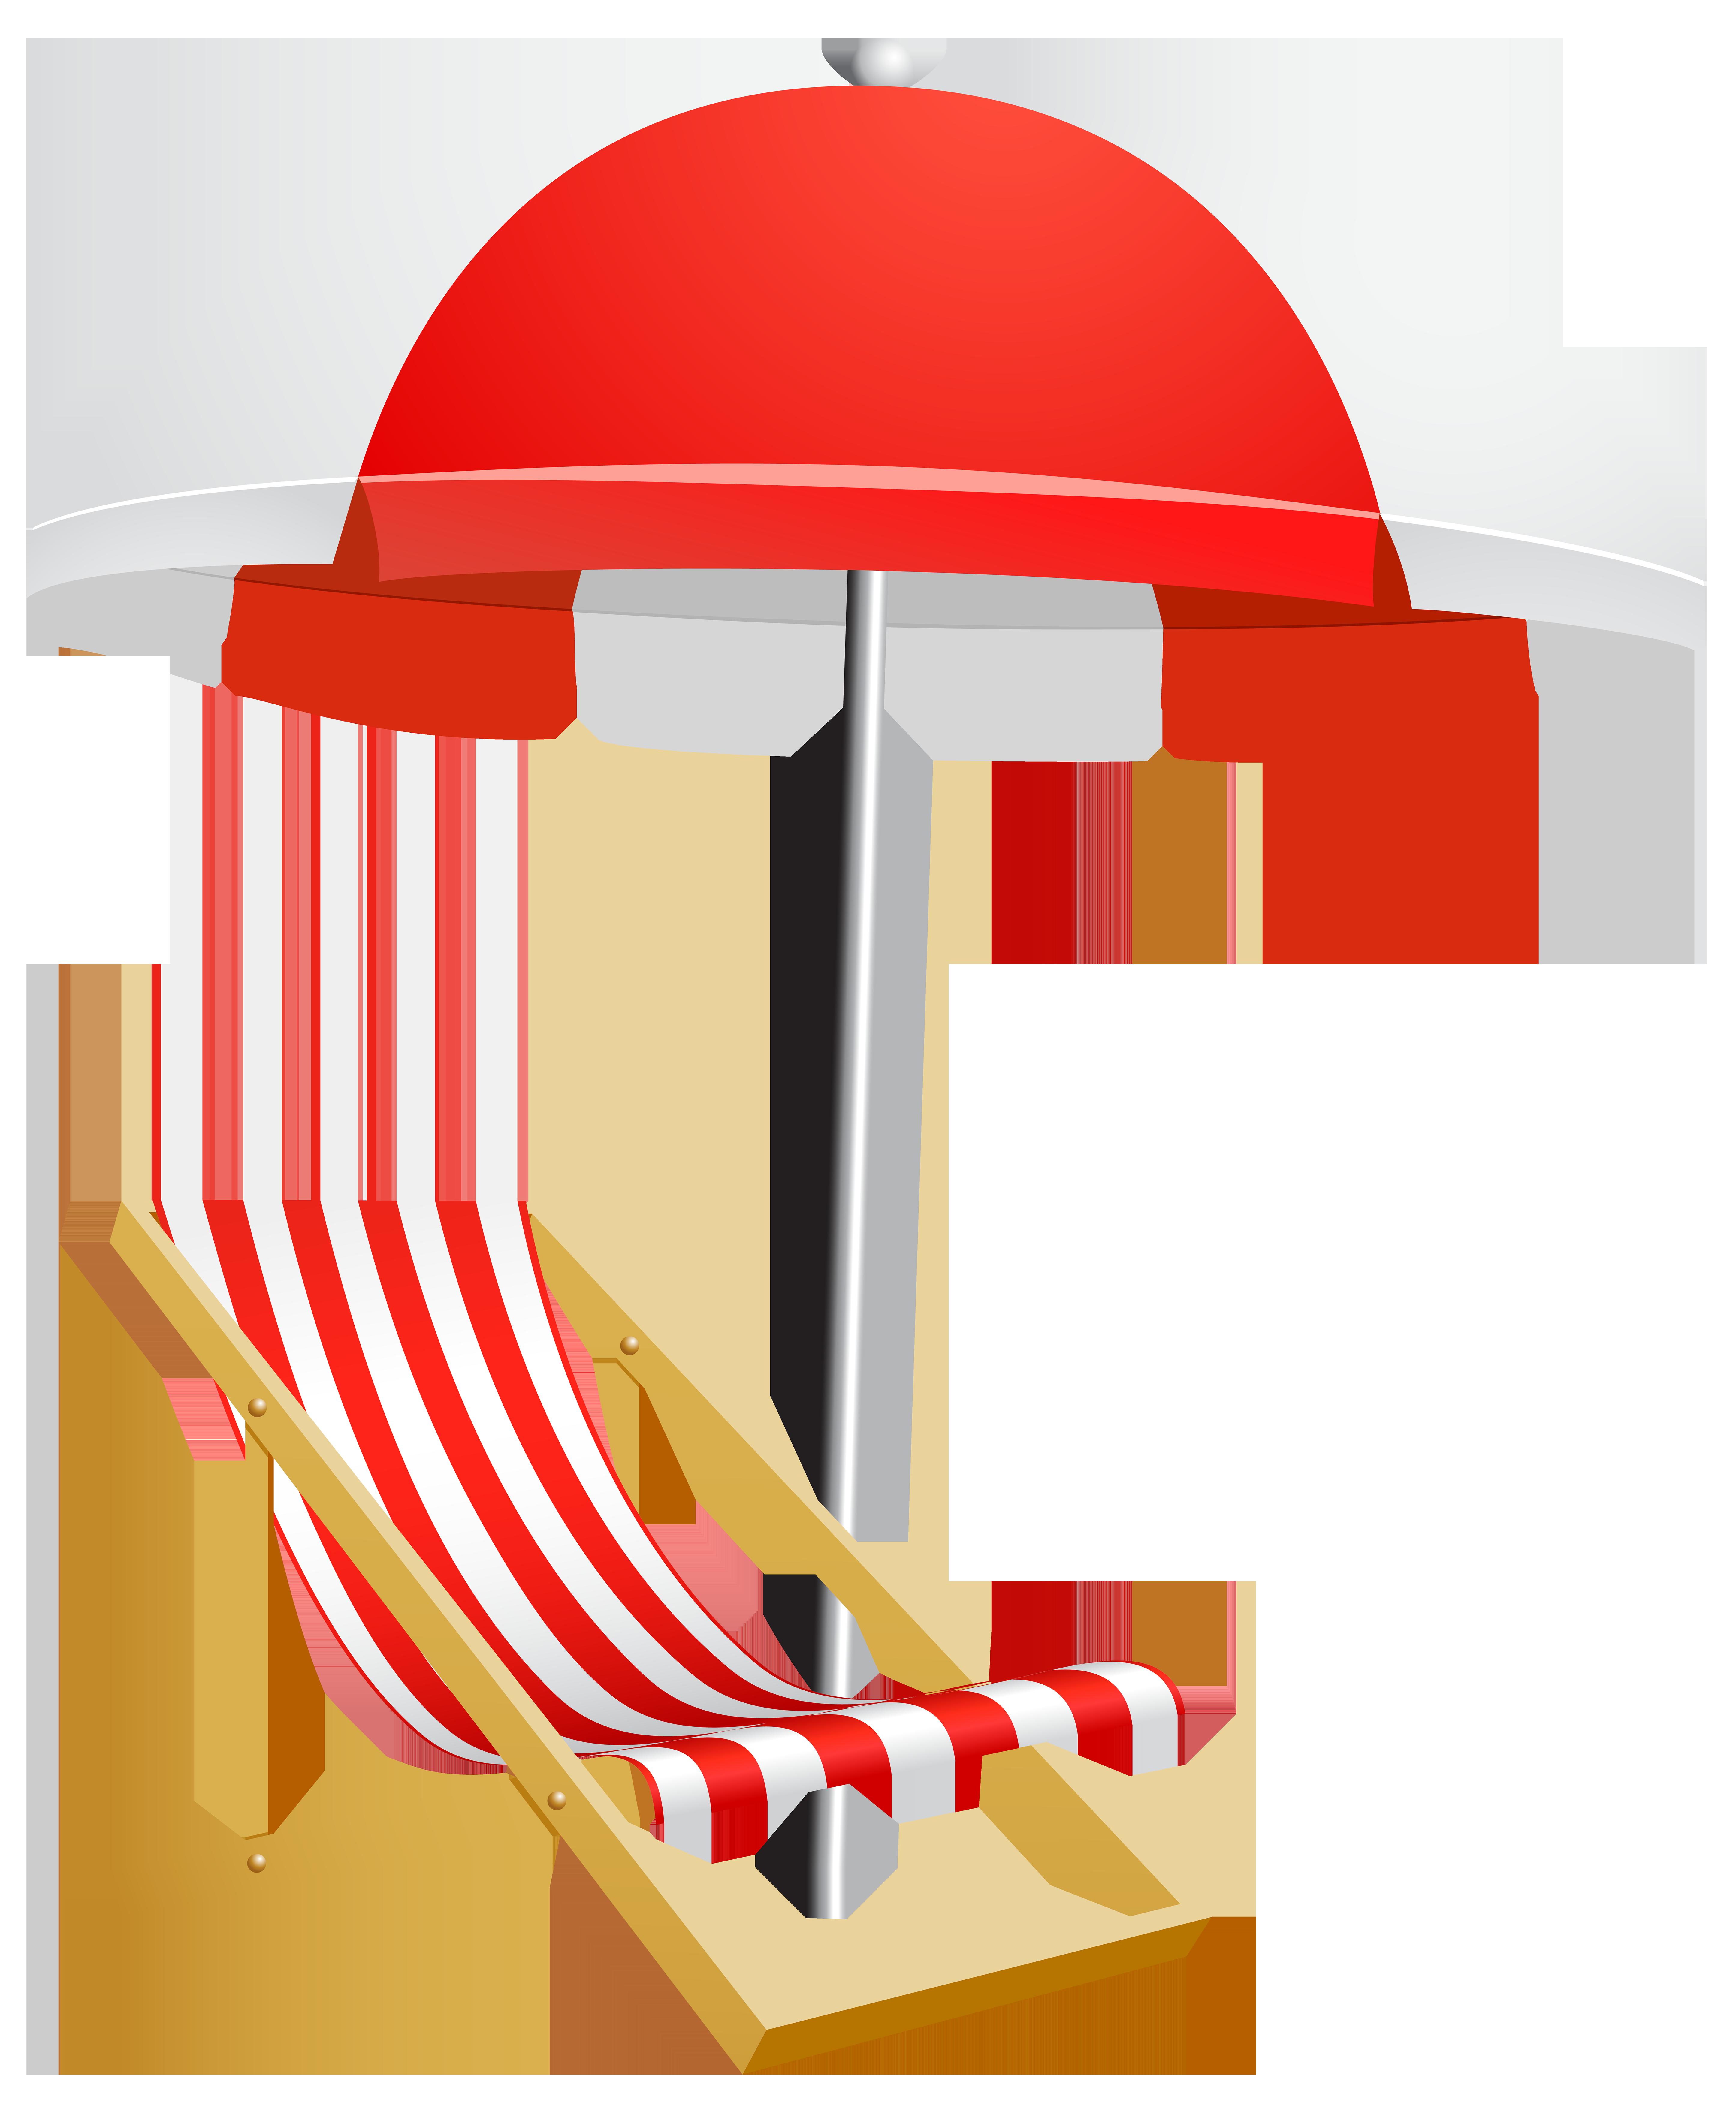 5783x7000 Beach Umbrella And Chair Transpa Png Clip Art Imageu200b Gallery